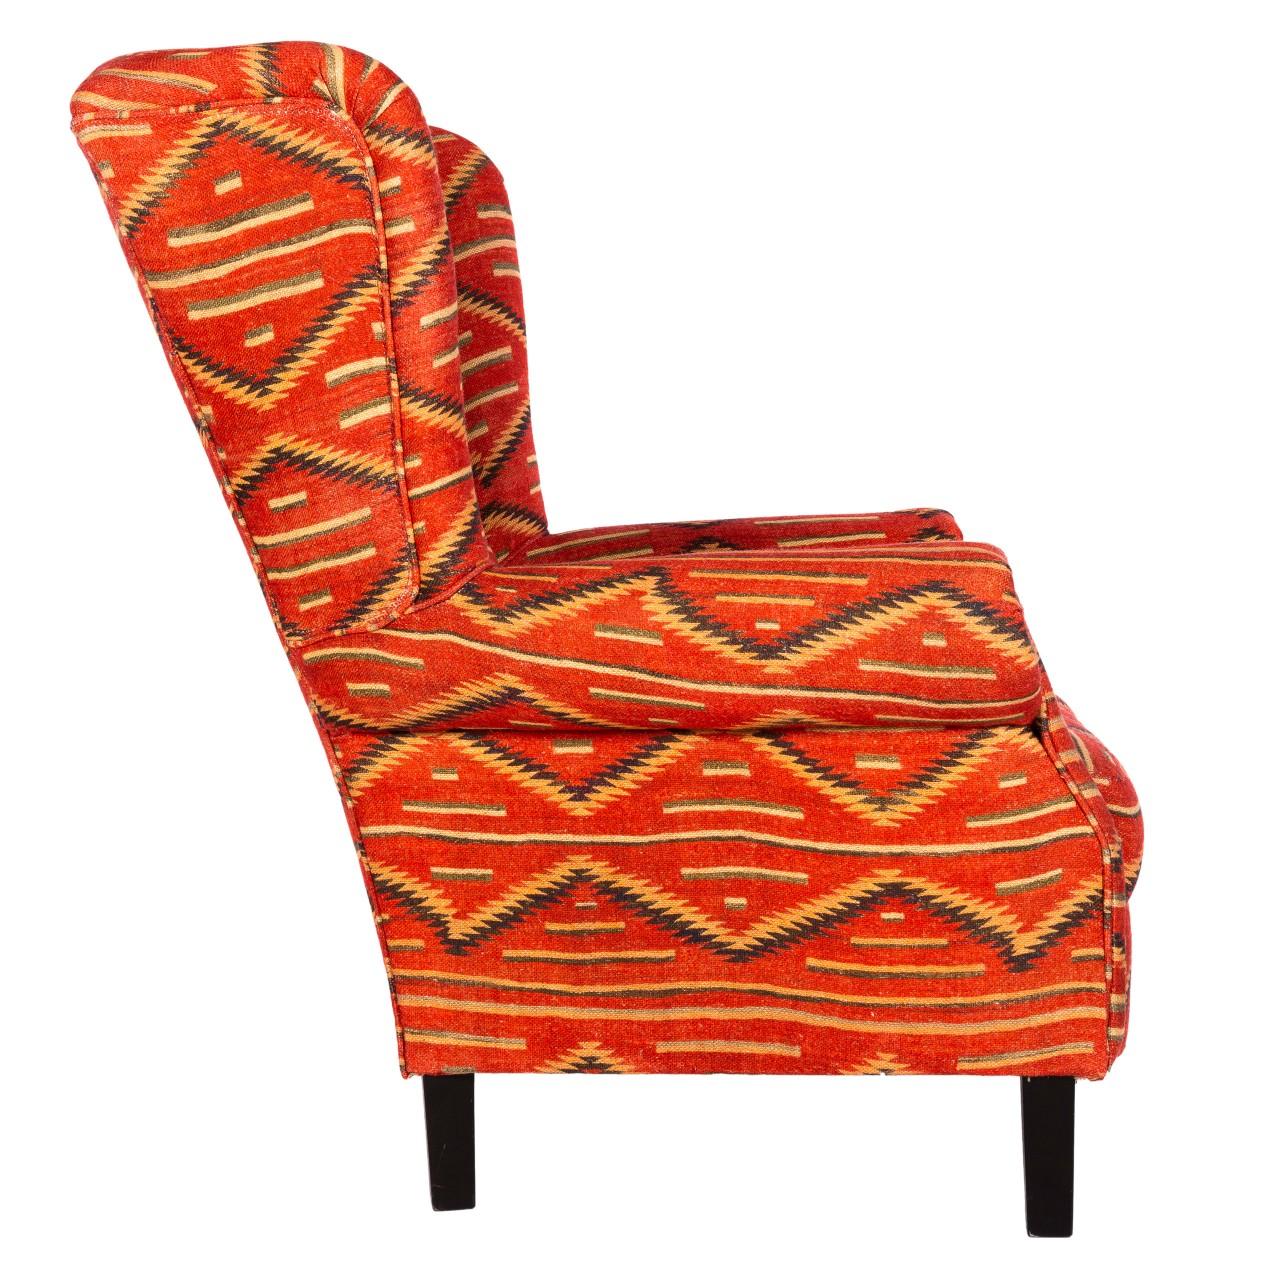 BRYANT Wing Chair - EYEDAZZLER NAVAJO Linen